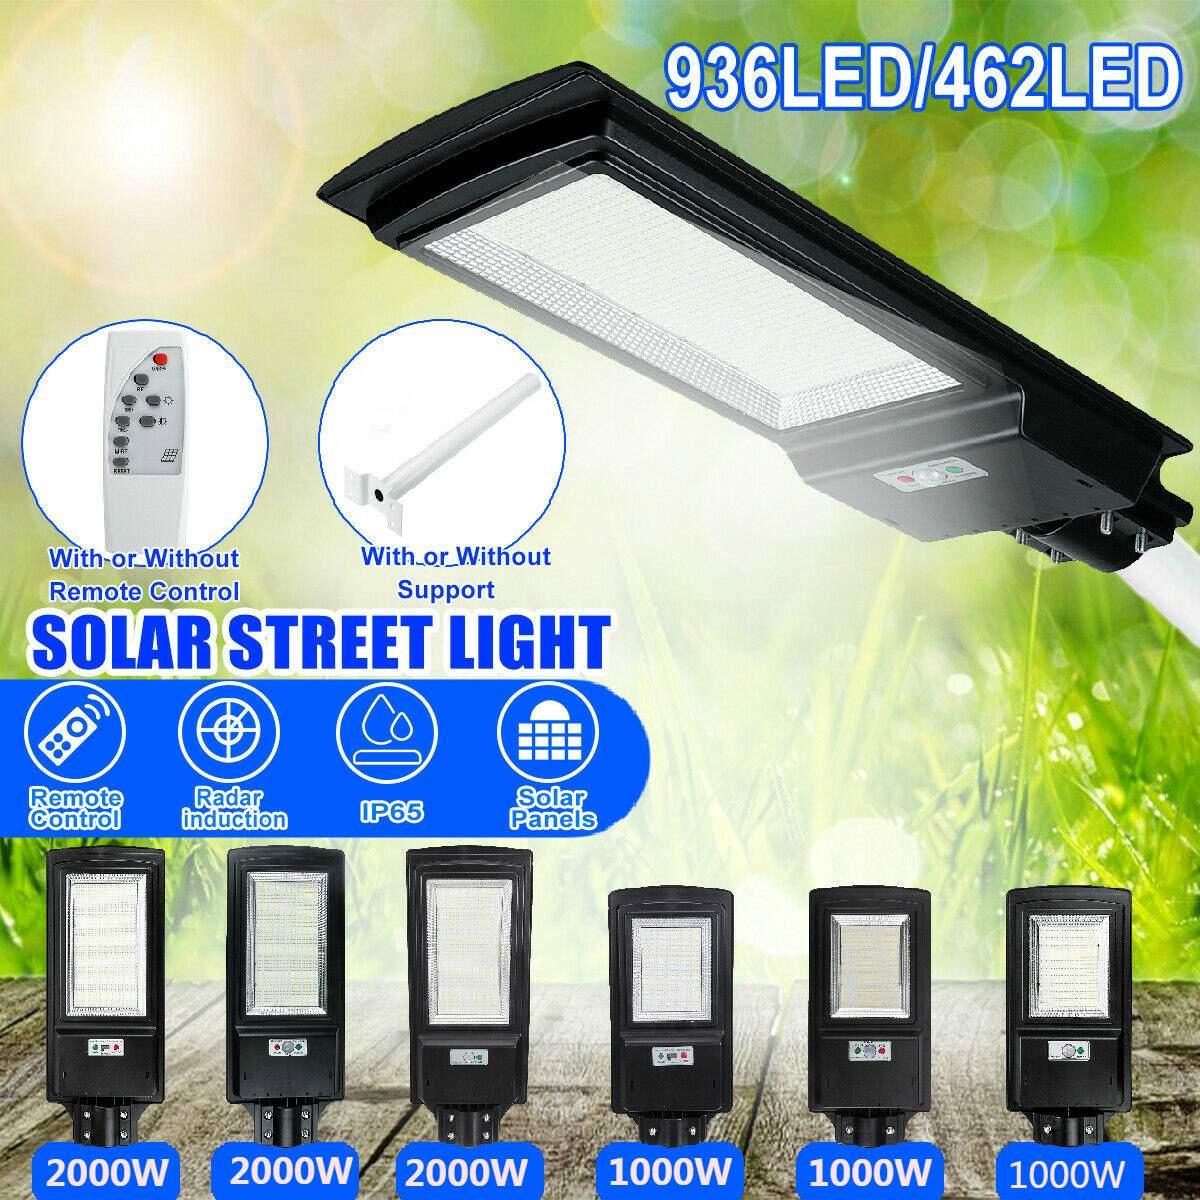 LED Solar Street Light 1000W 2000W IP65 8500K Light Radar Motion Sensor Wall Timing Lamp Remote Control for Garden Outdoor